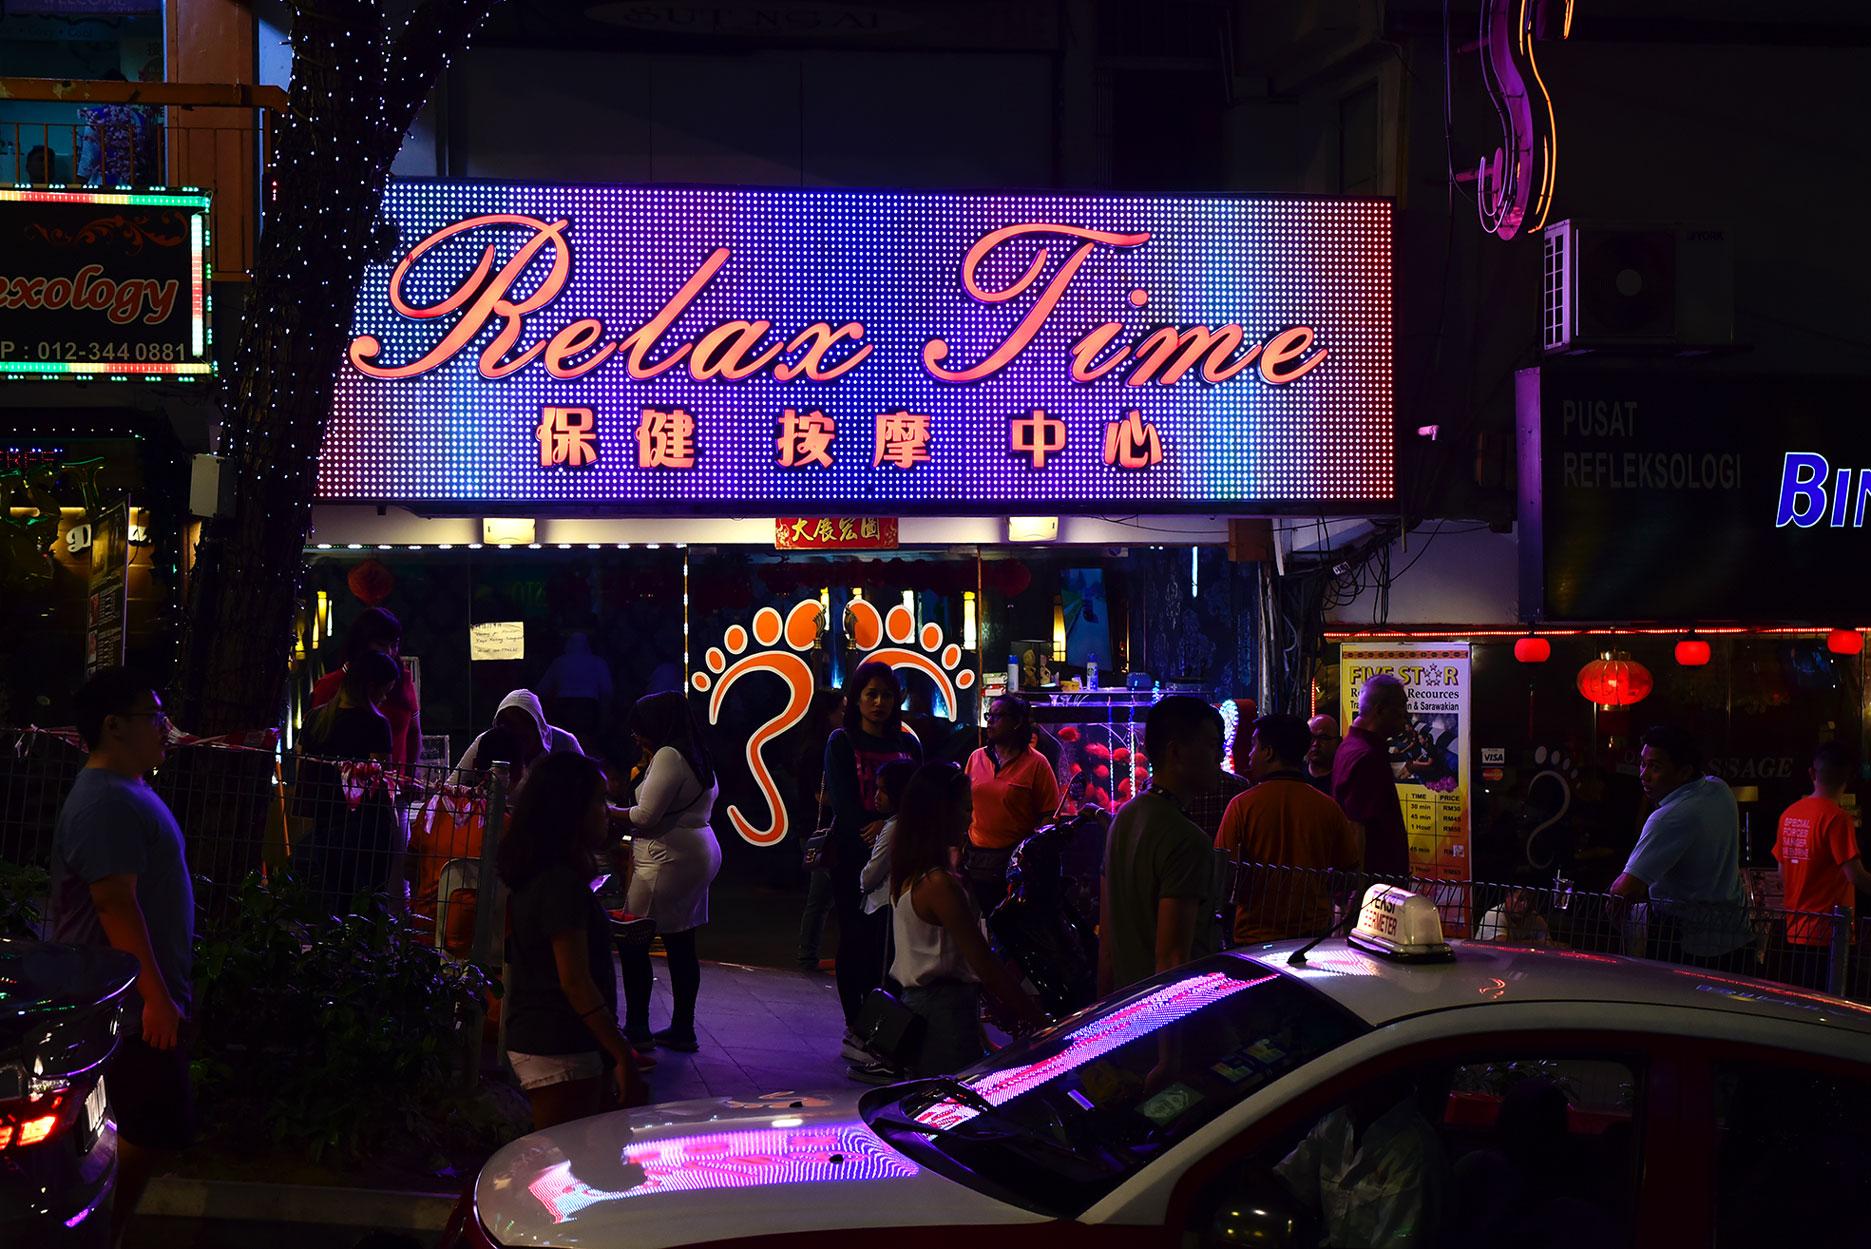 KL - Jalan Alor Nachtmarkt